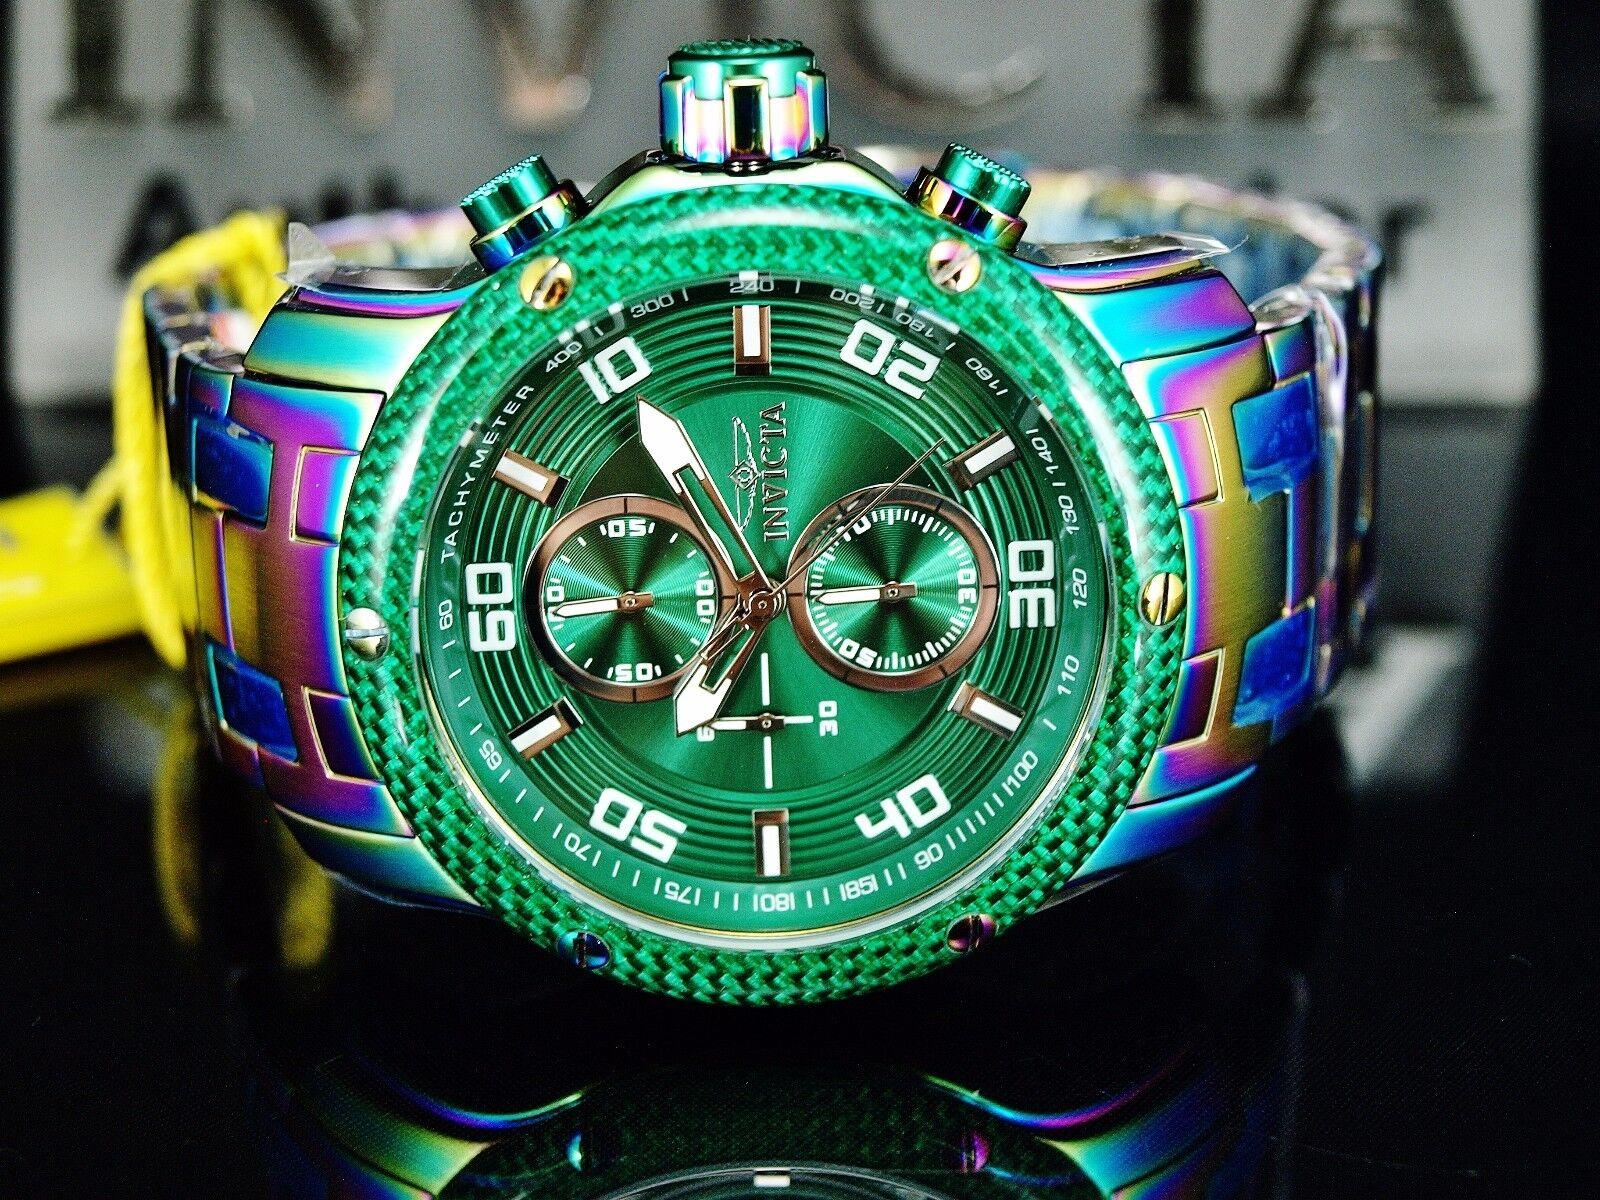 $144.99 - Invicta Men's Pro Diver Scuba Chronograph Rainbow Iridescent Green Dial SS Watch